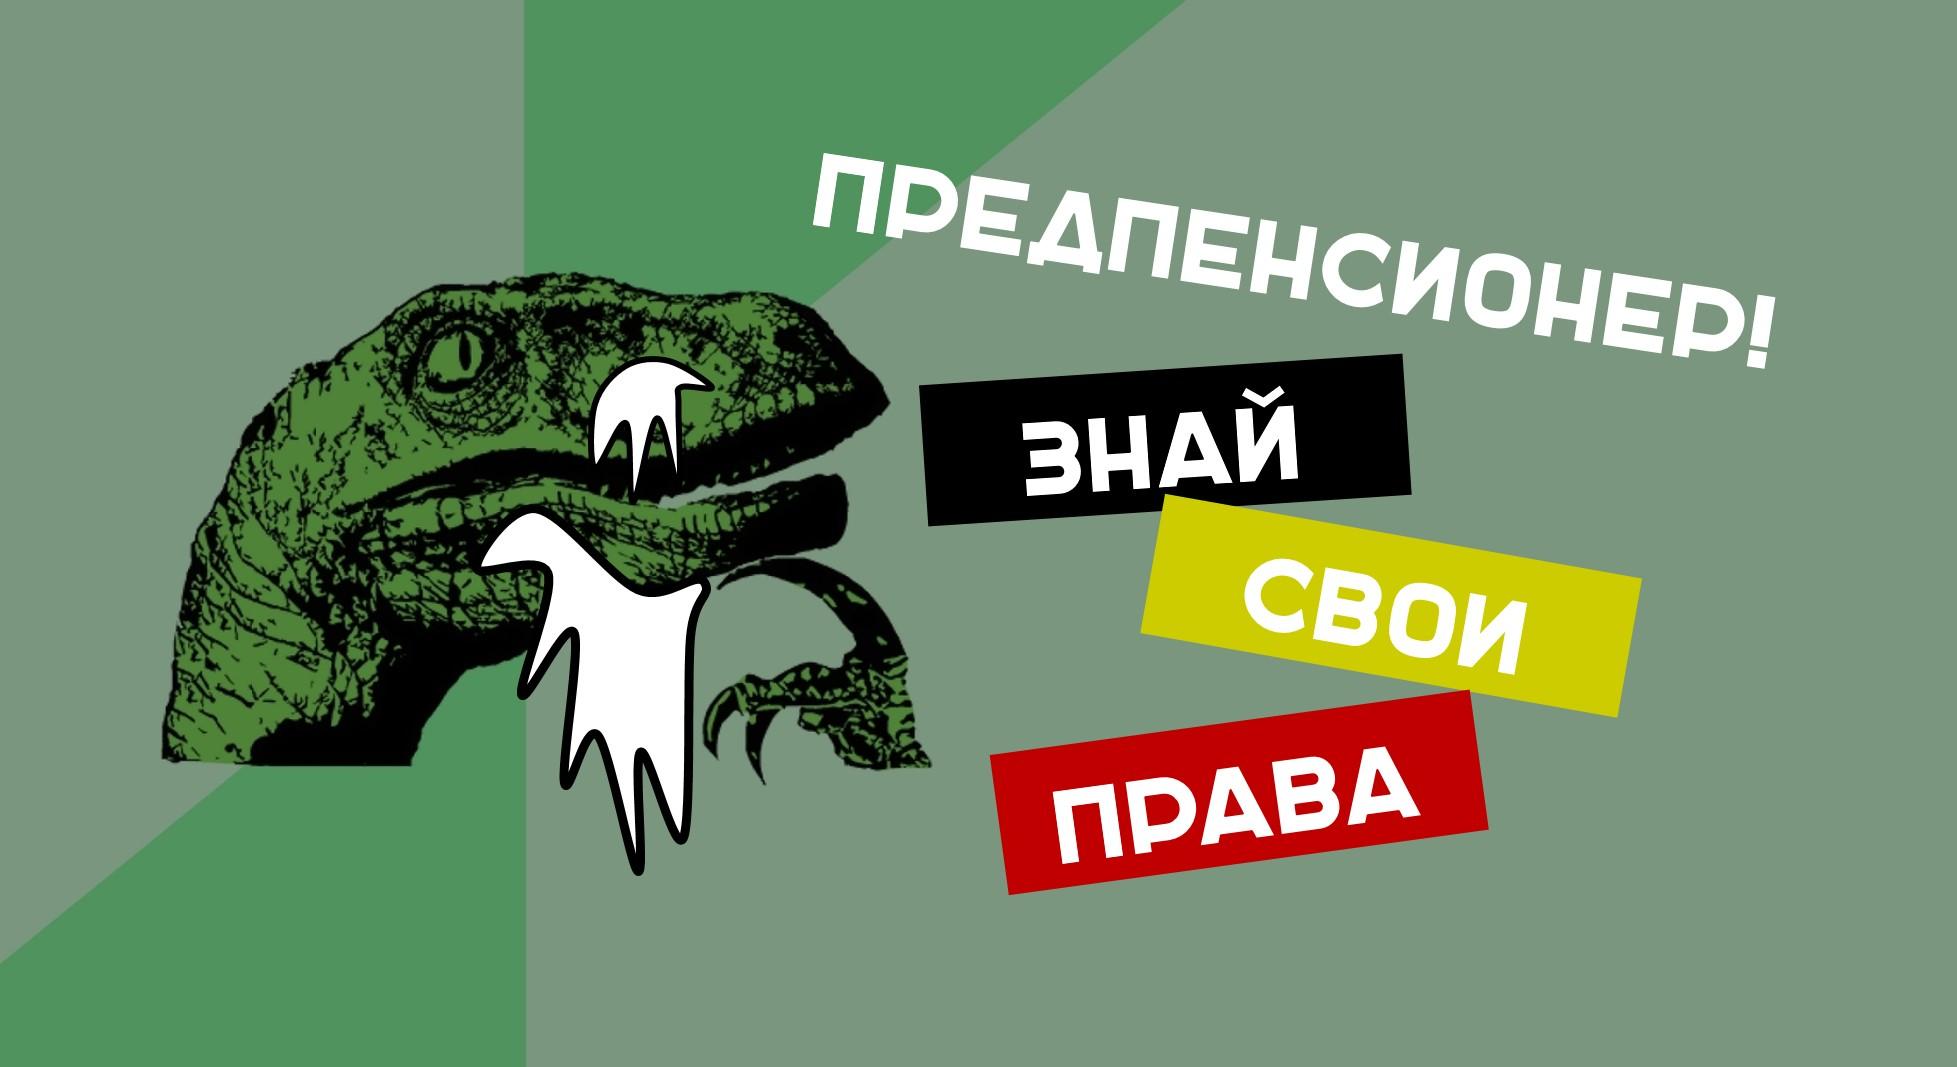 льготы для предпенсионеров https://grosh-blog.ru